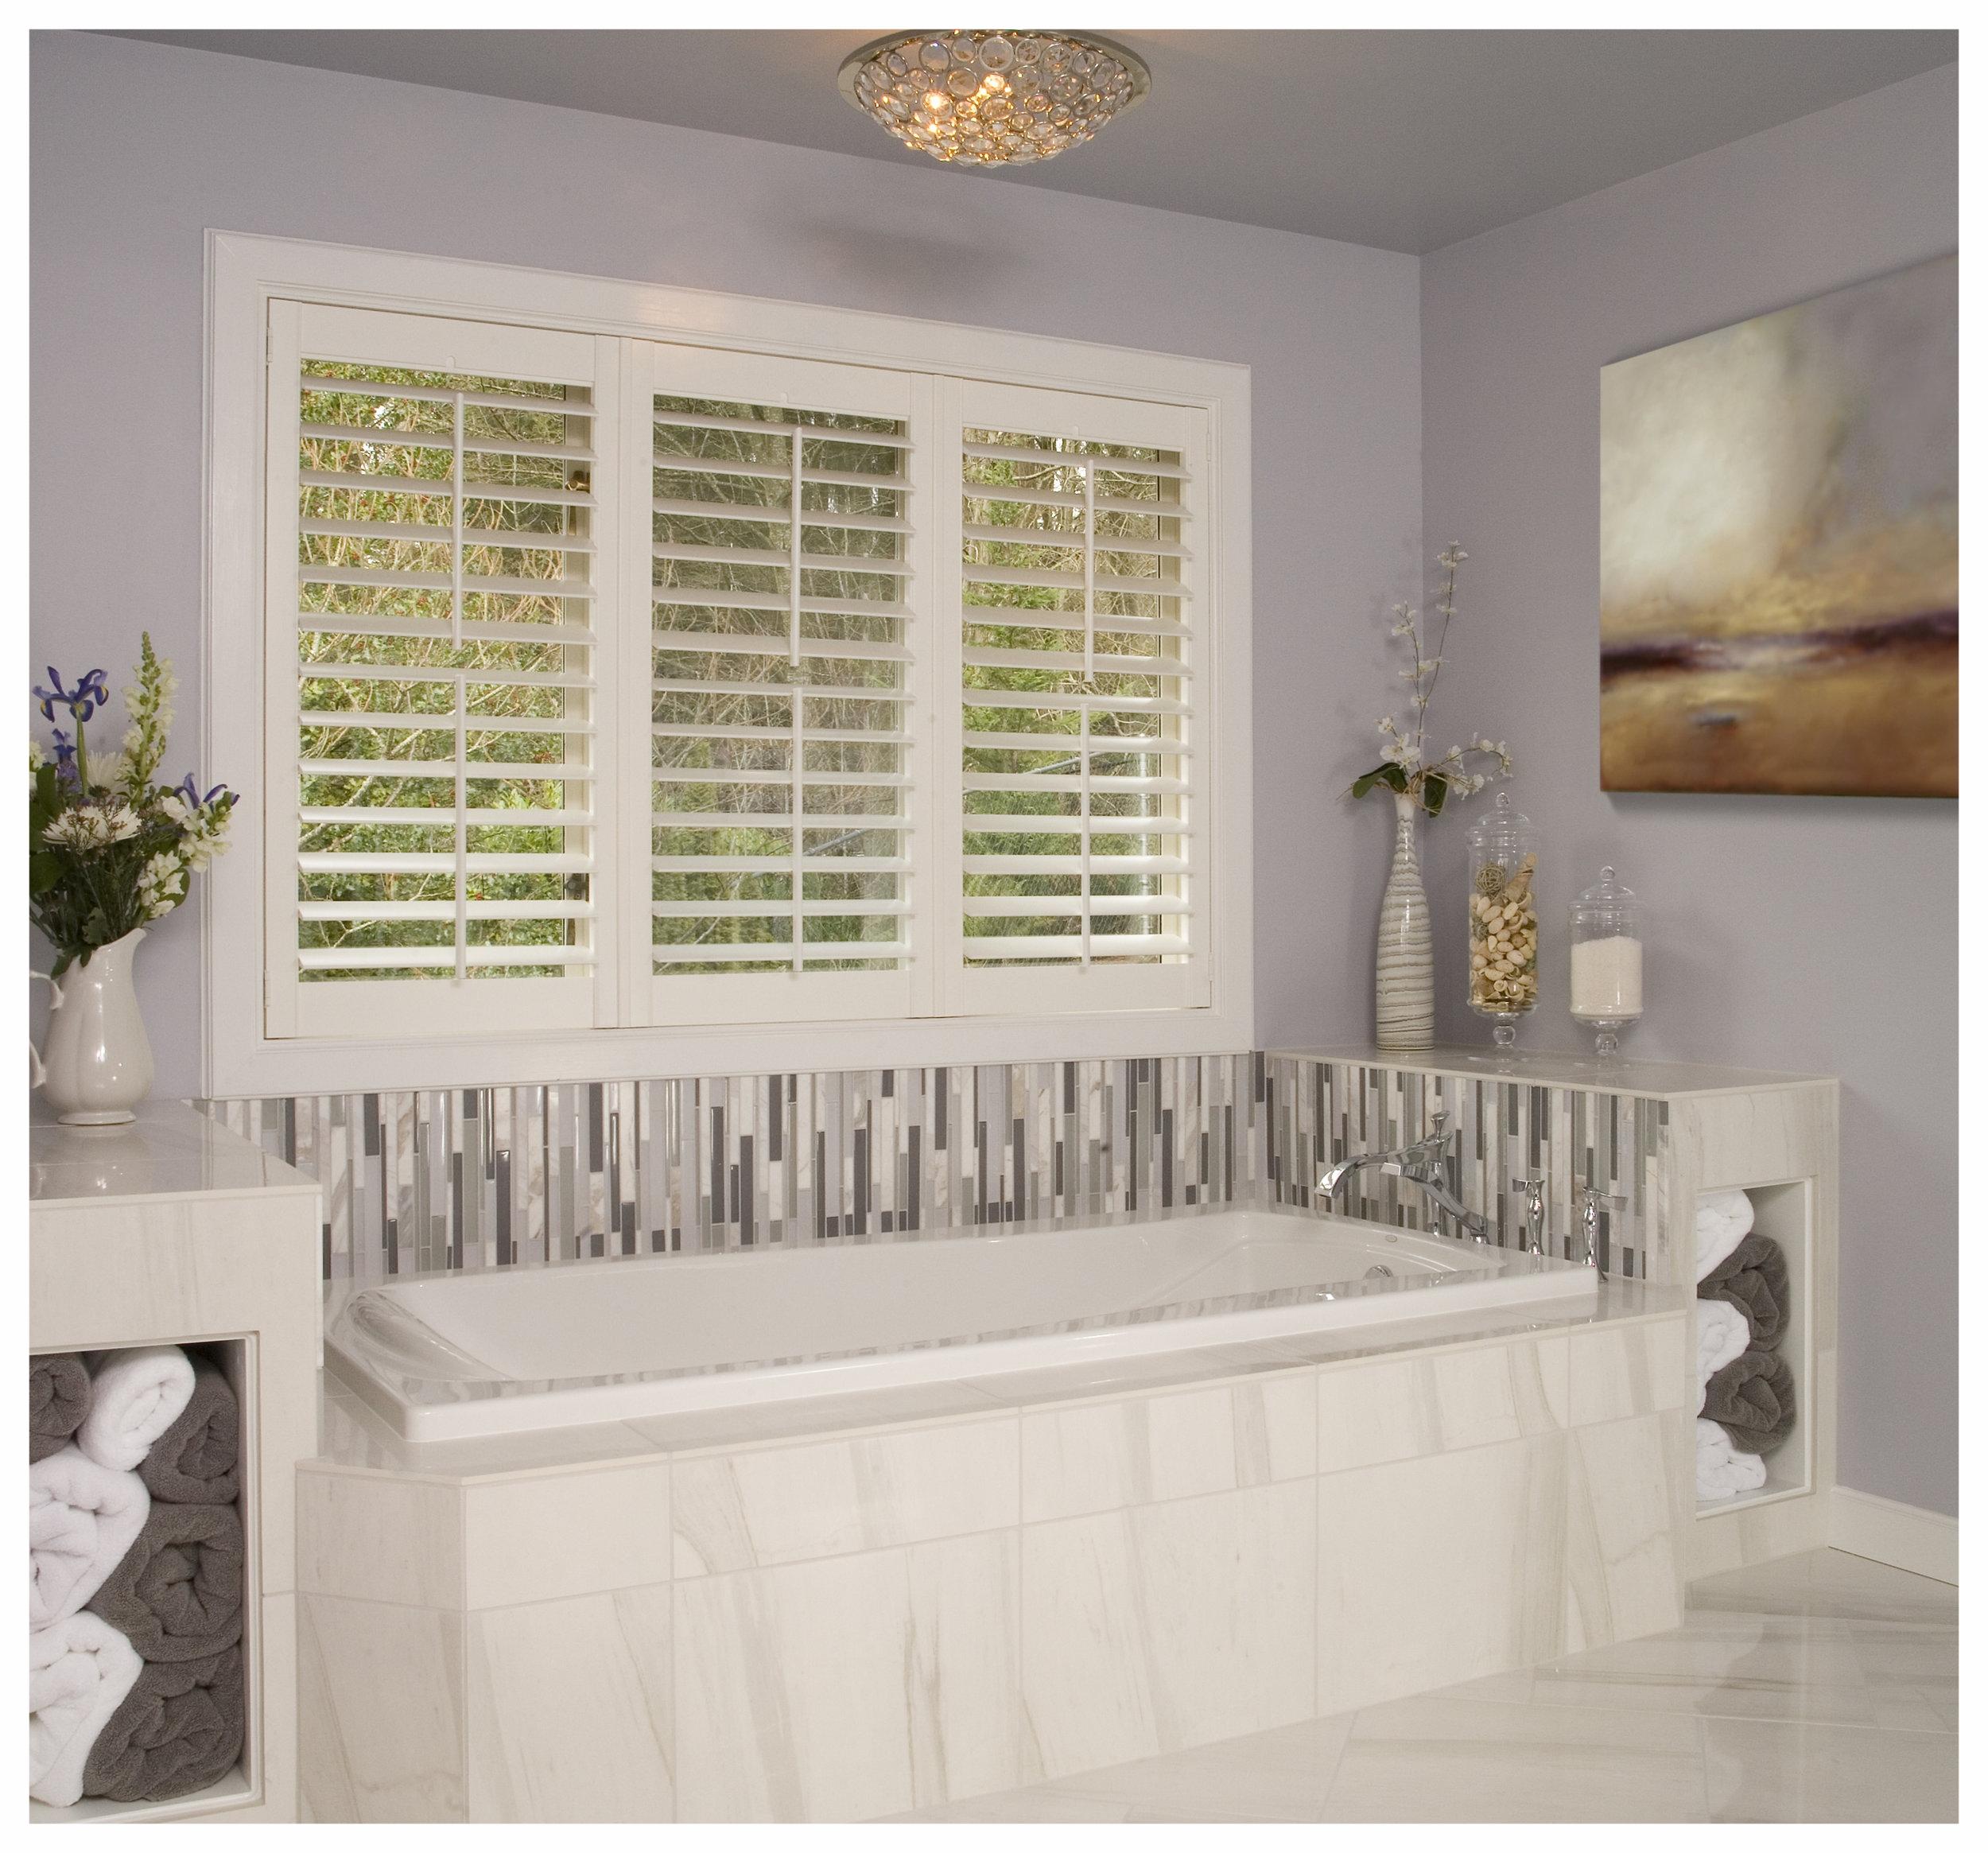 Redmond Traditional Master Bath 4.jpg